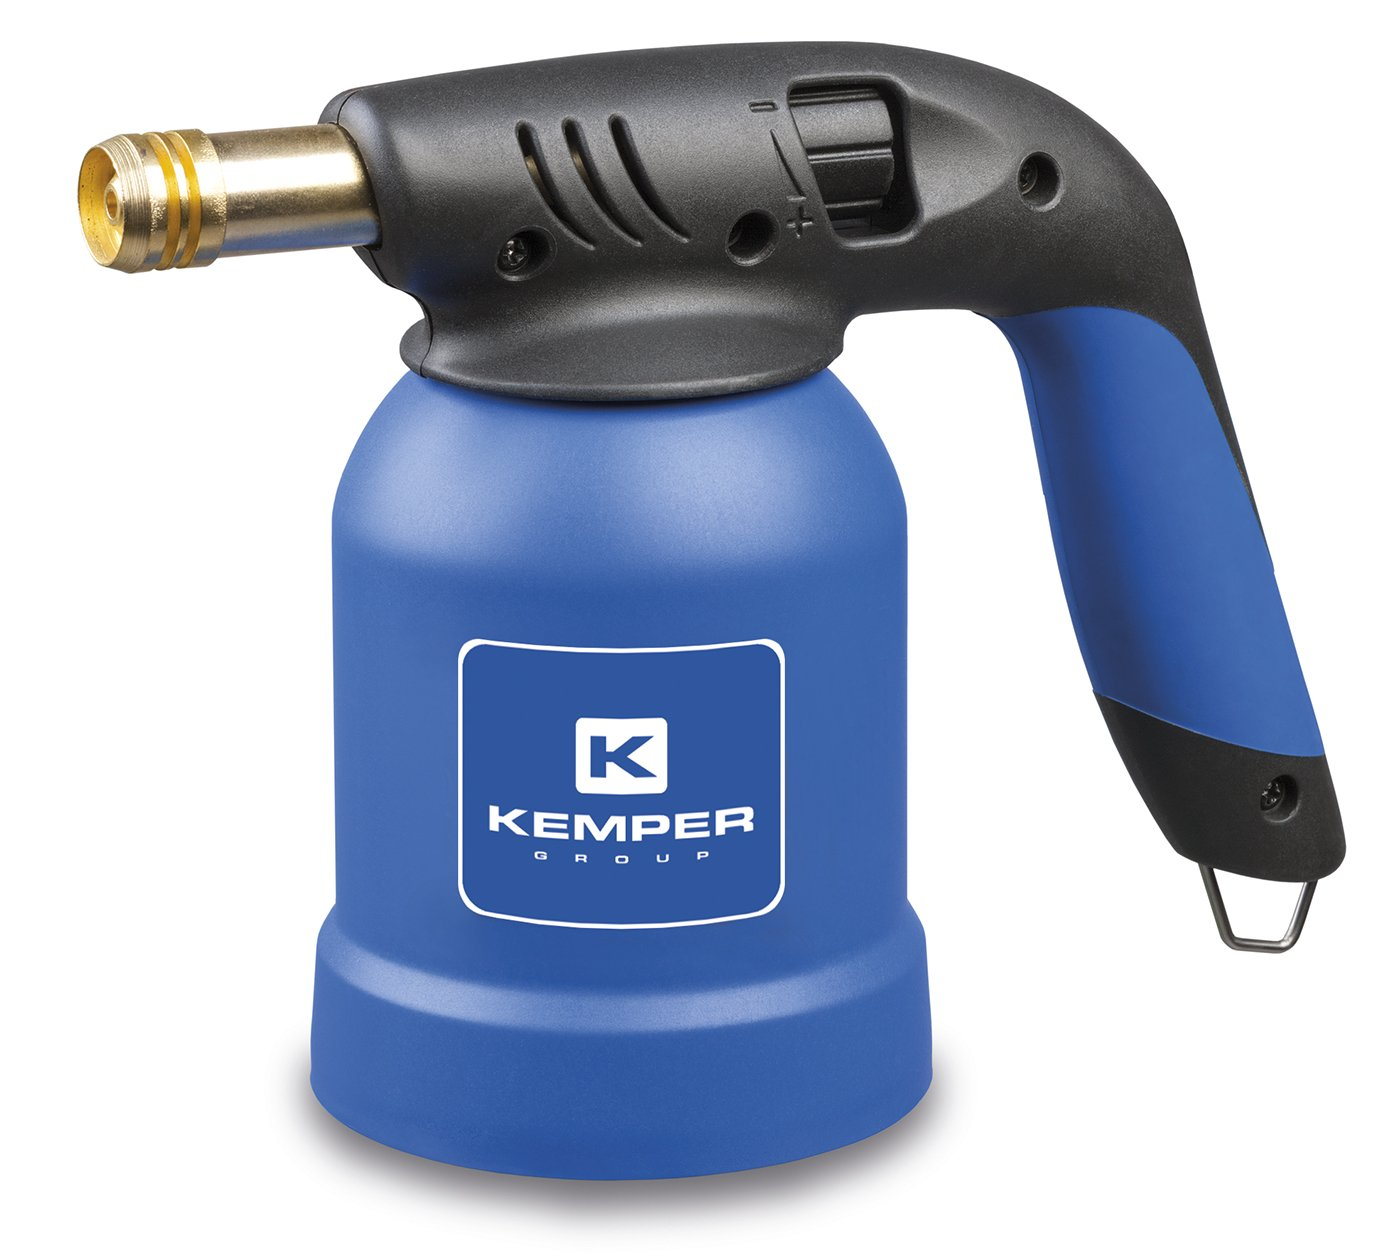 Kemper KE2018 Soplete, Negro, Azul